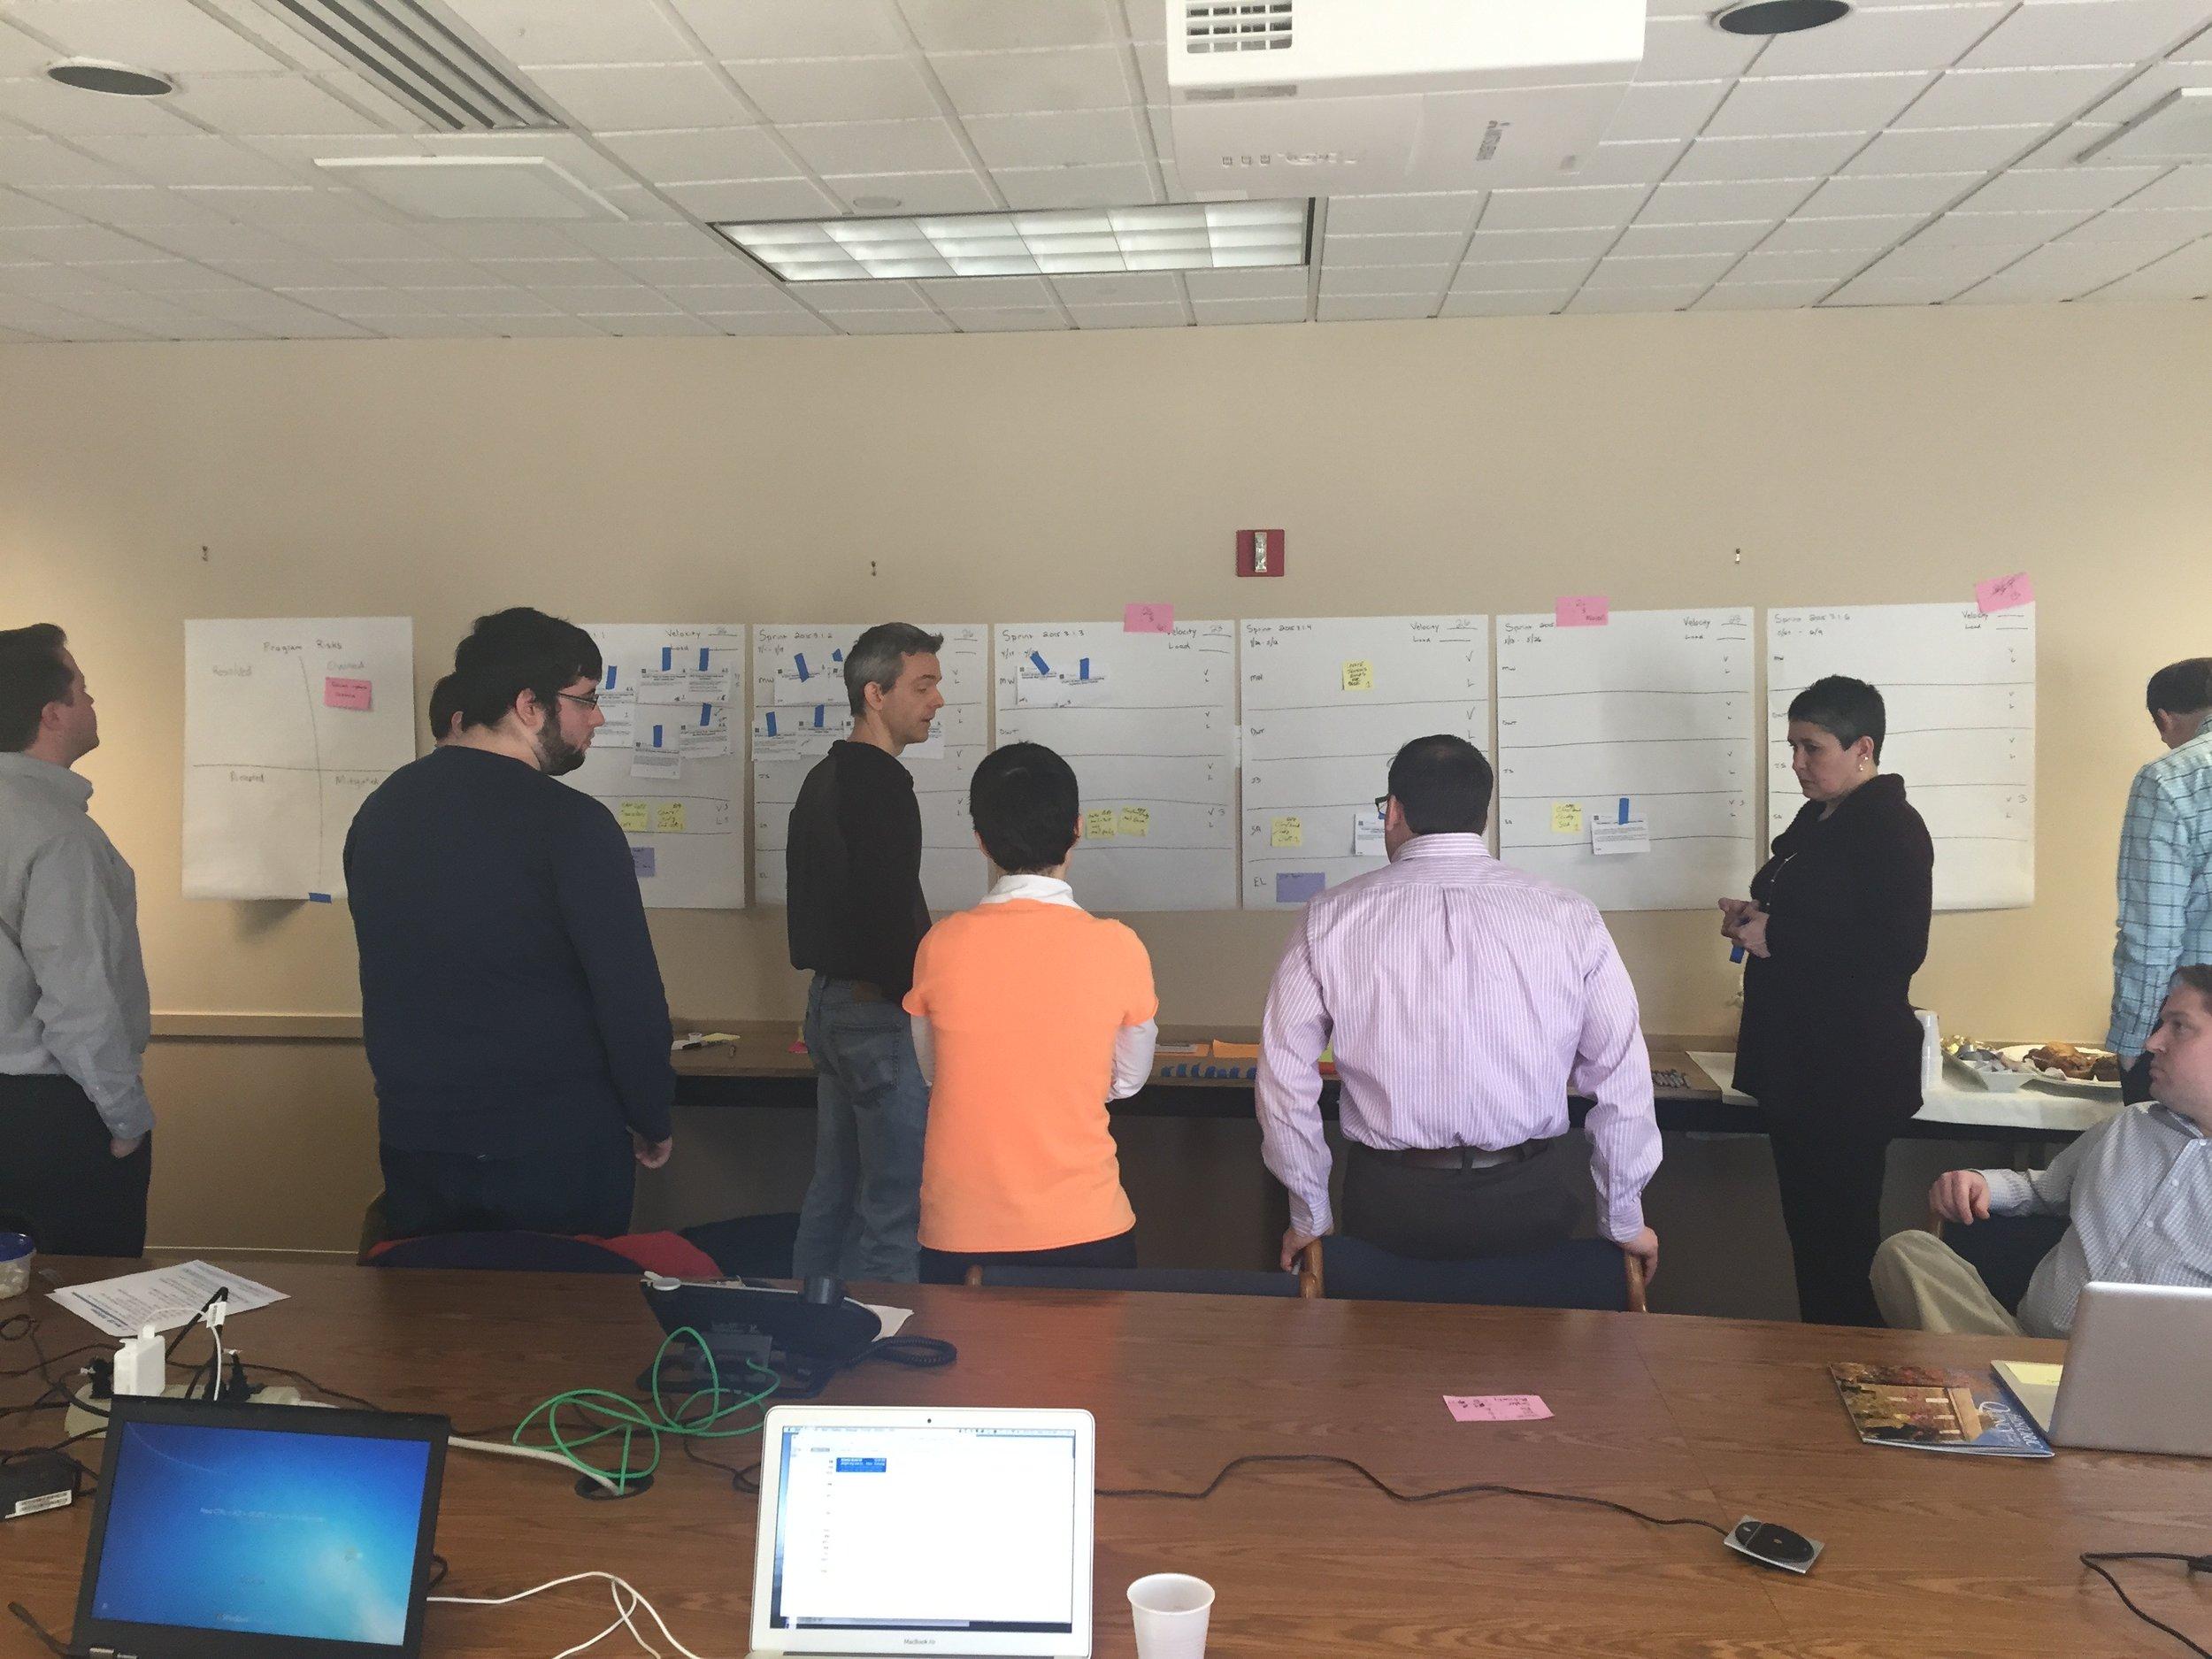 Agile SCRUM Quarterly Planning Process